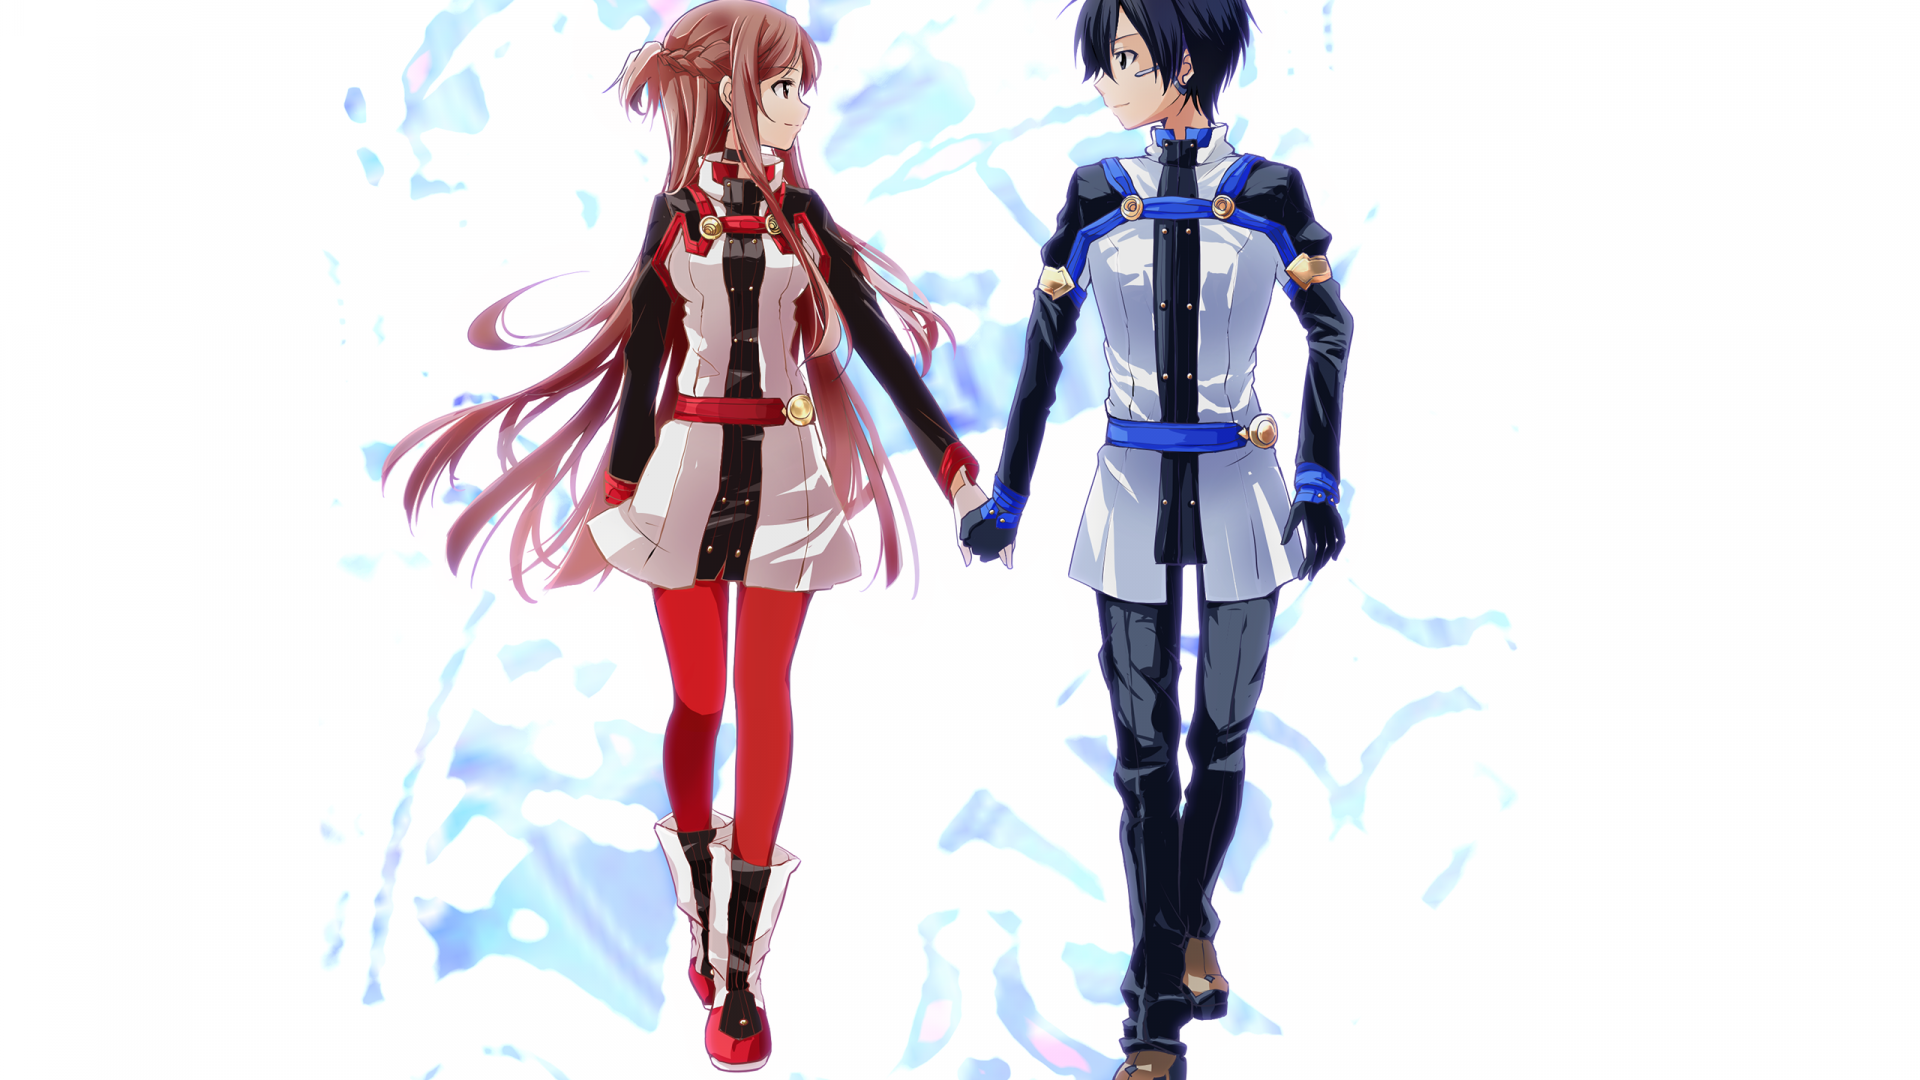 Anime couple, SAO, Sword Art online